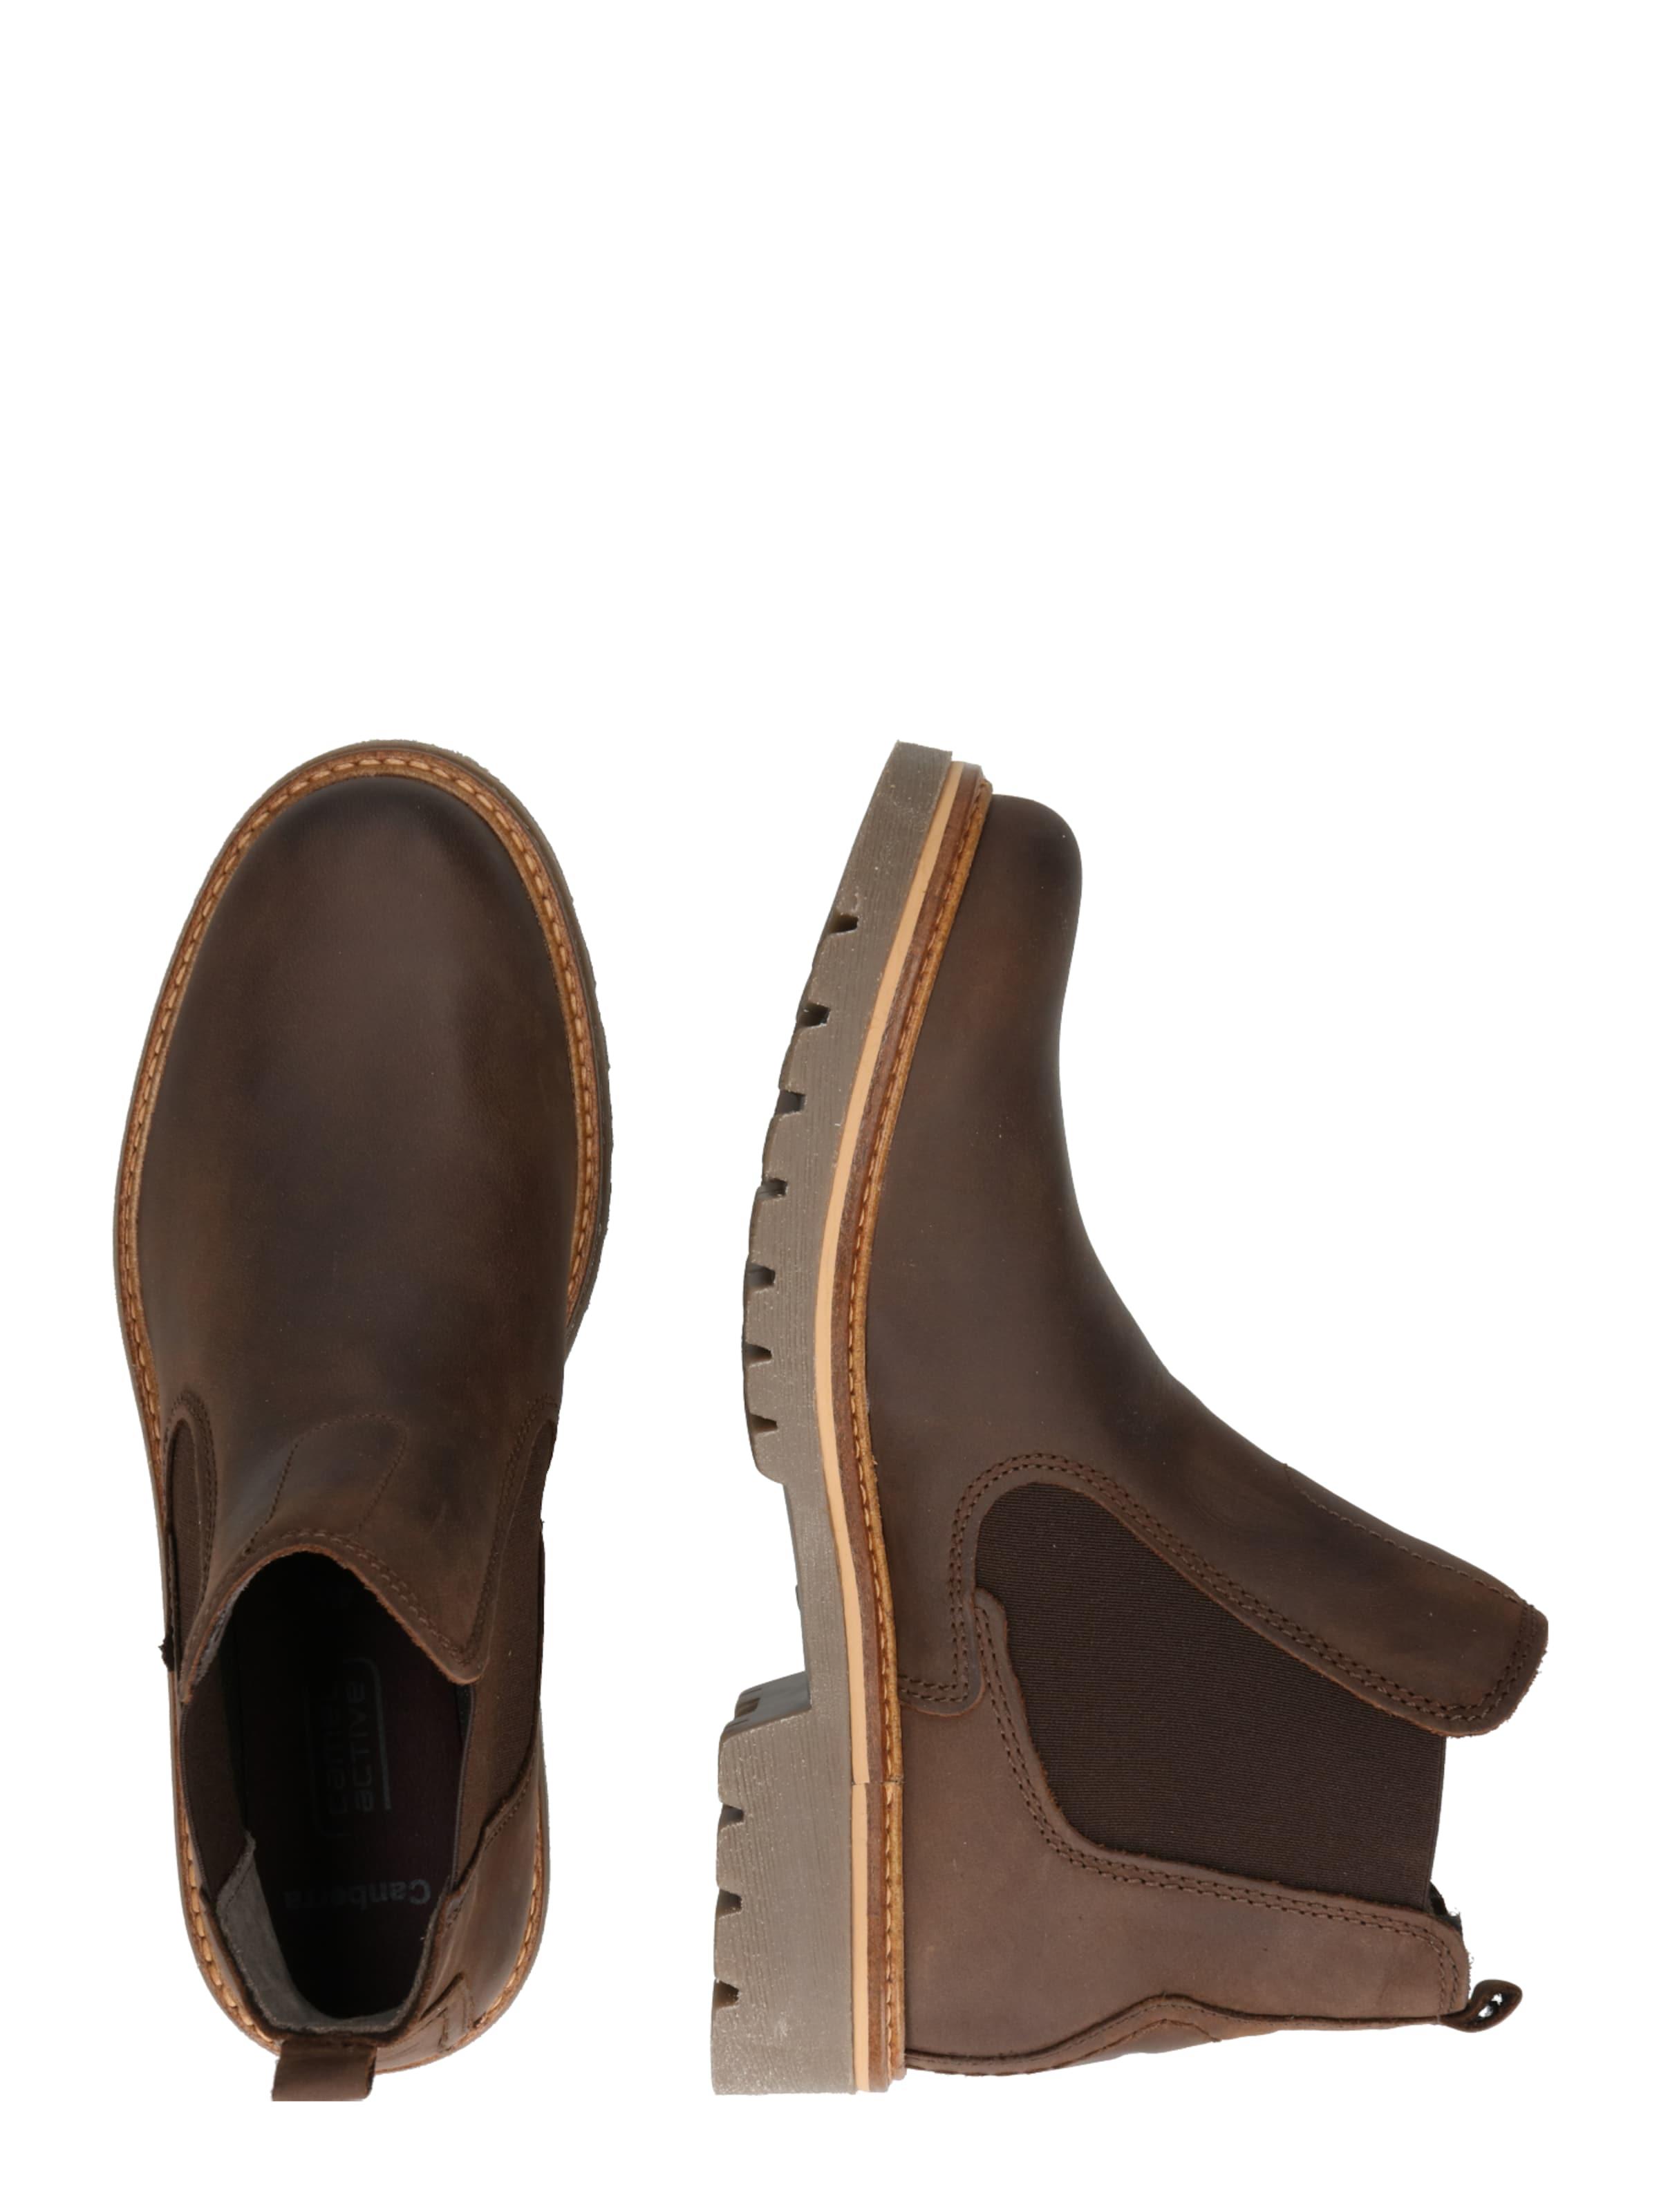 'canberra' Boots Mokka Camel Active Chelsea In ARj5L4